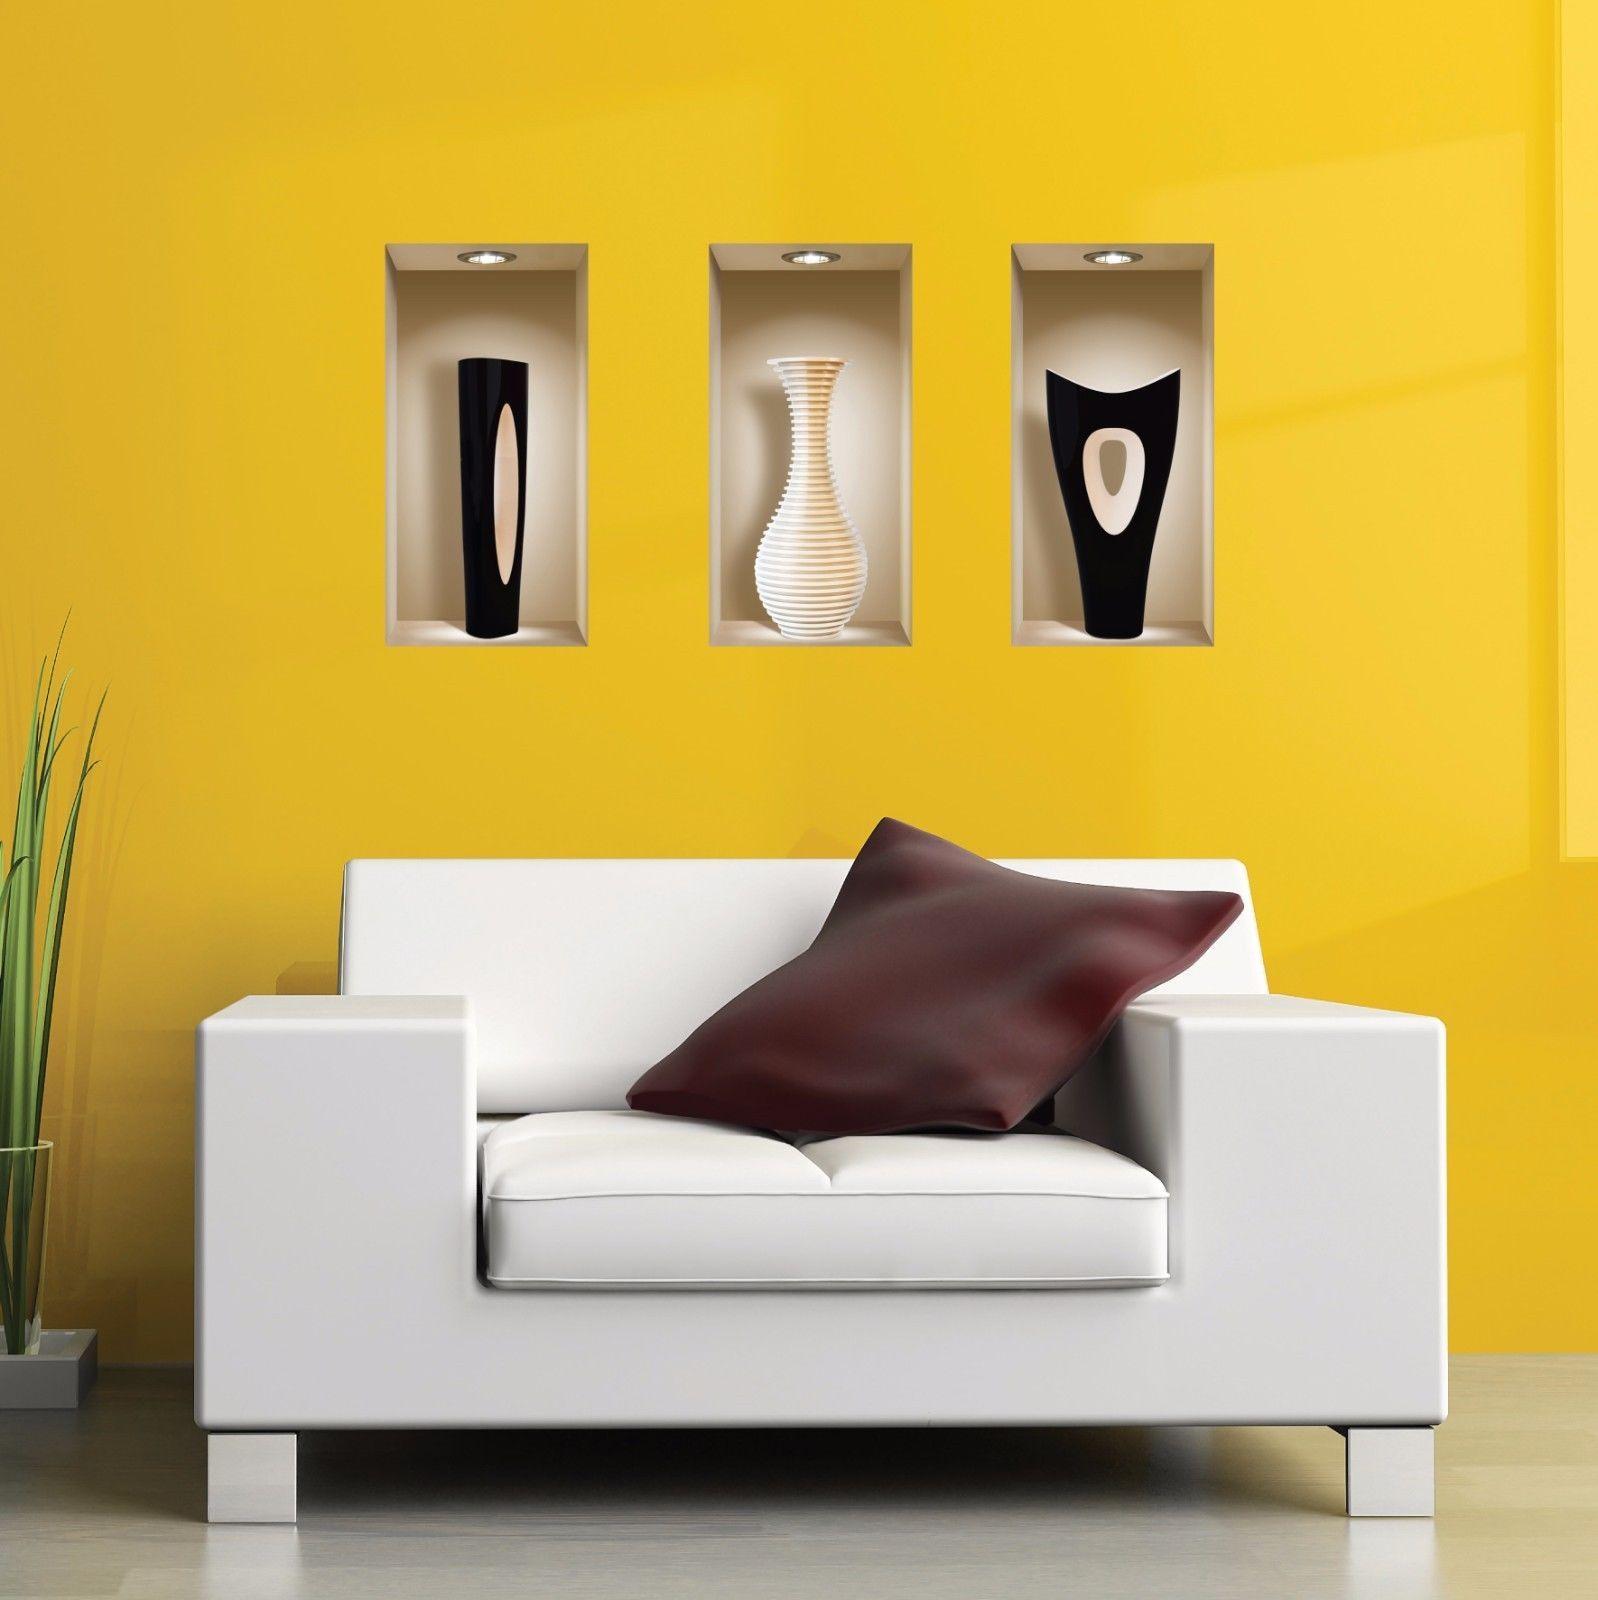 Set art black white wall stickers d picture vinyl removable tile